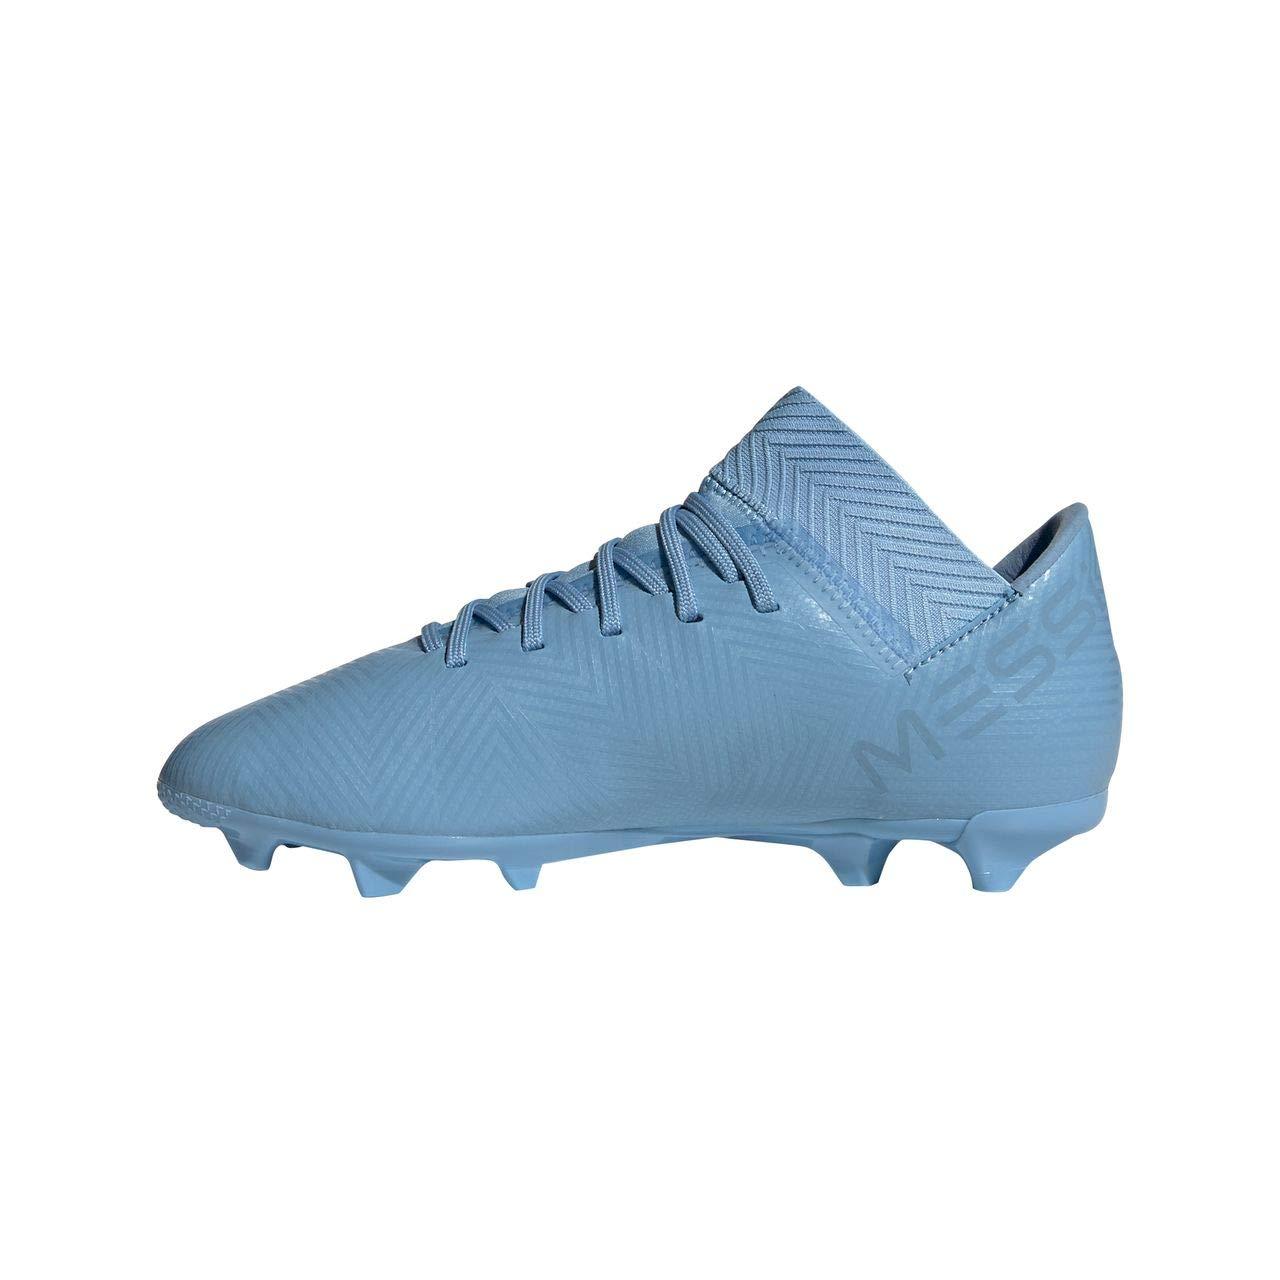 Adidas Unisex-Kinder Nemeziz Messi 18.3 Fg J Fußballschuhe